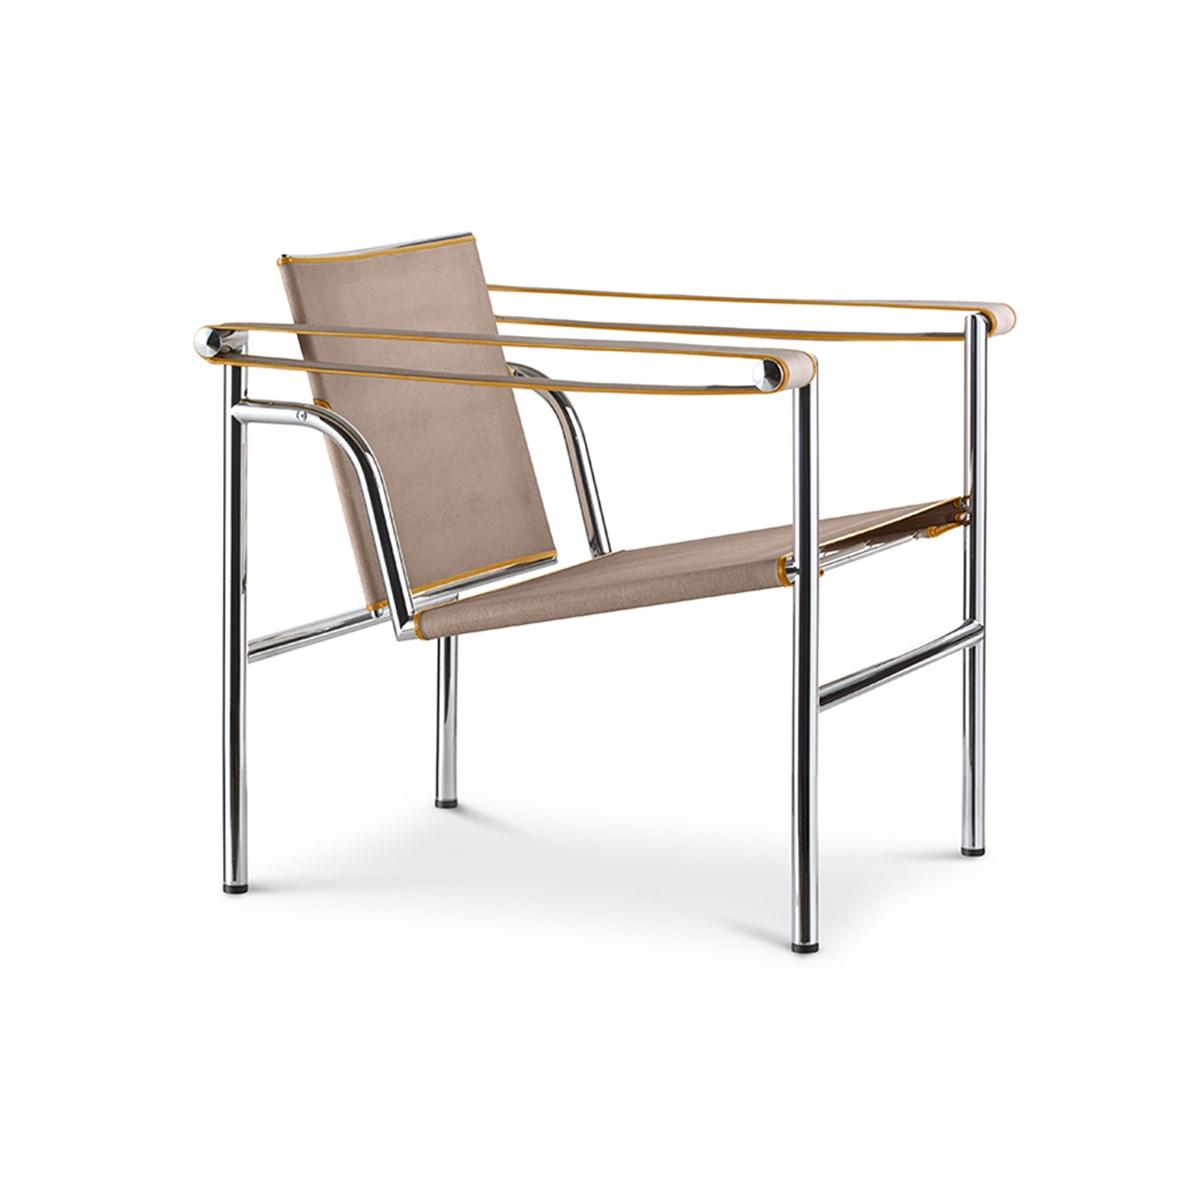 Cassina-Le-Corbusier, Pierre-Jeanneret-Charlotte-Perriand-LC1-UAM-Matisse-1